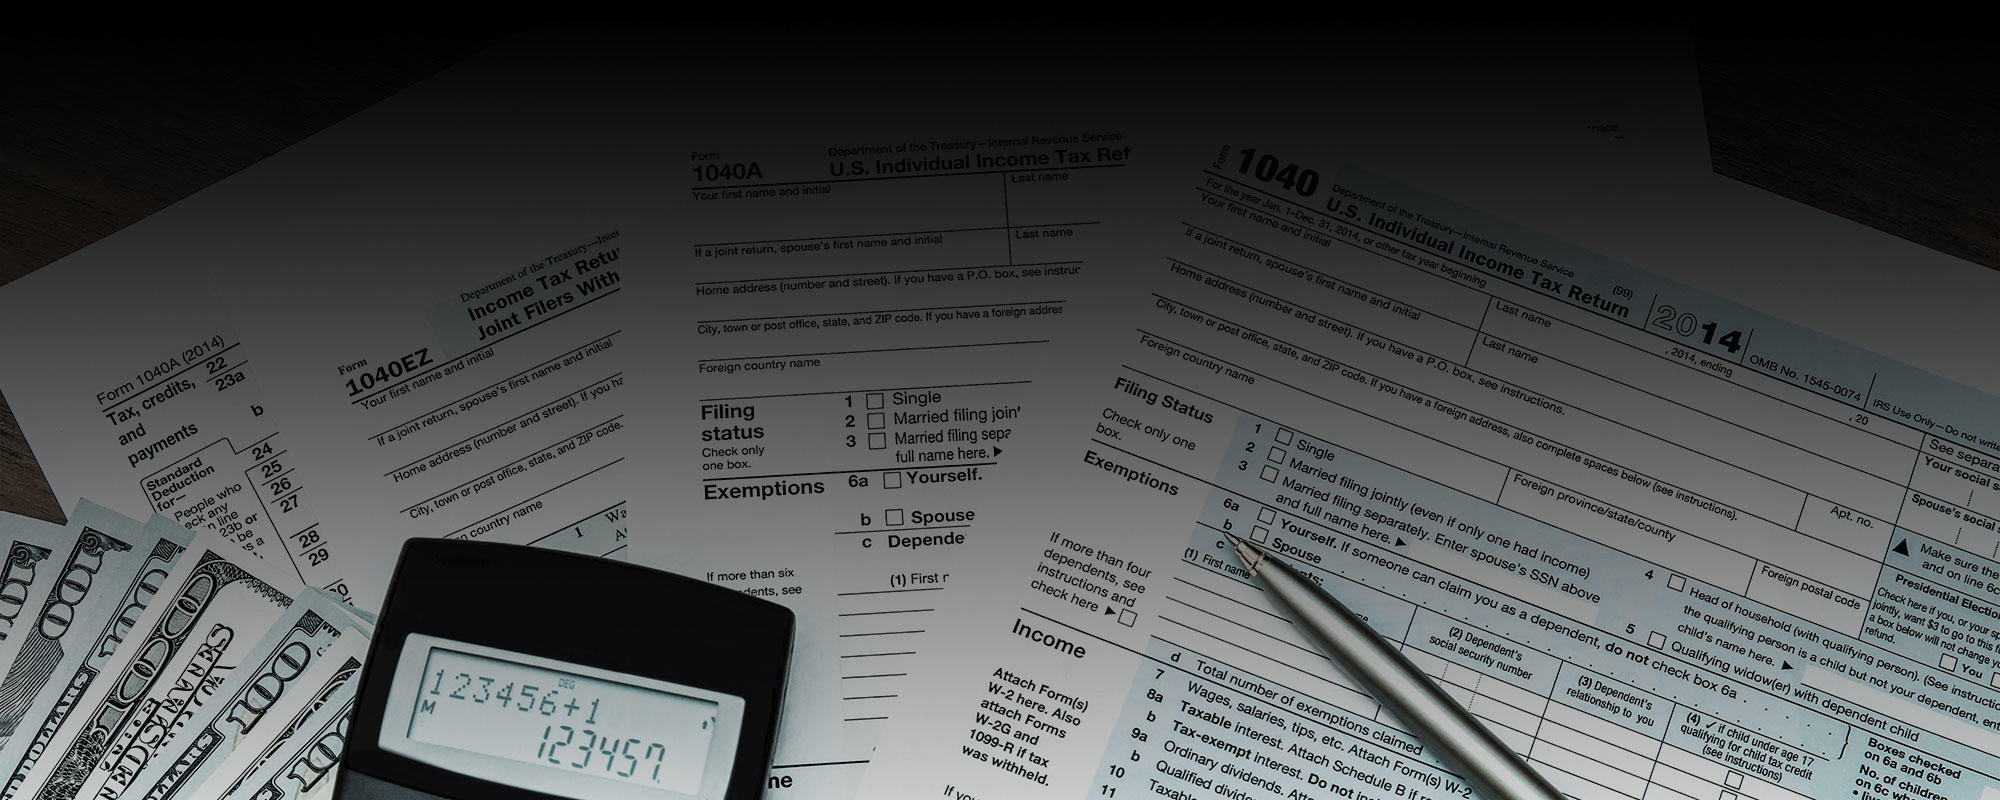 V.E Income Tax image 1